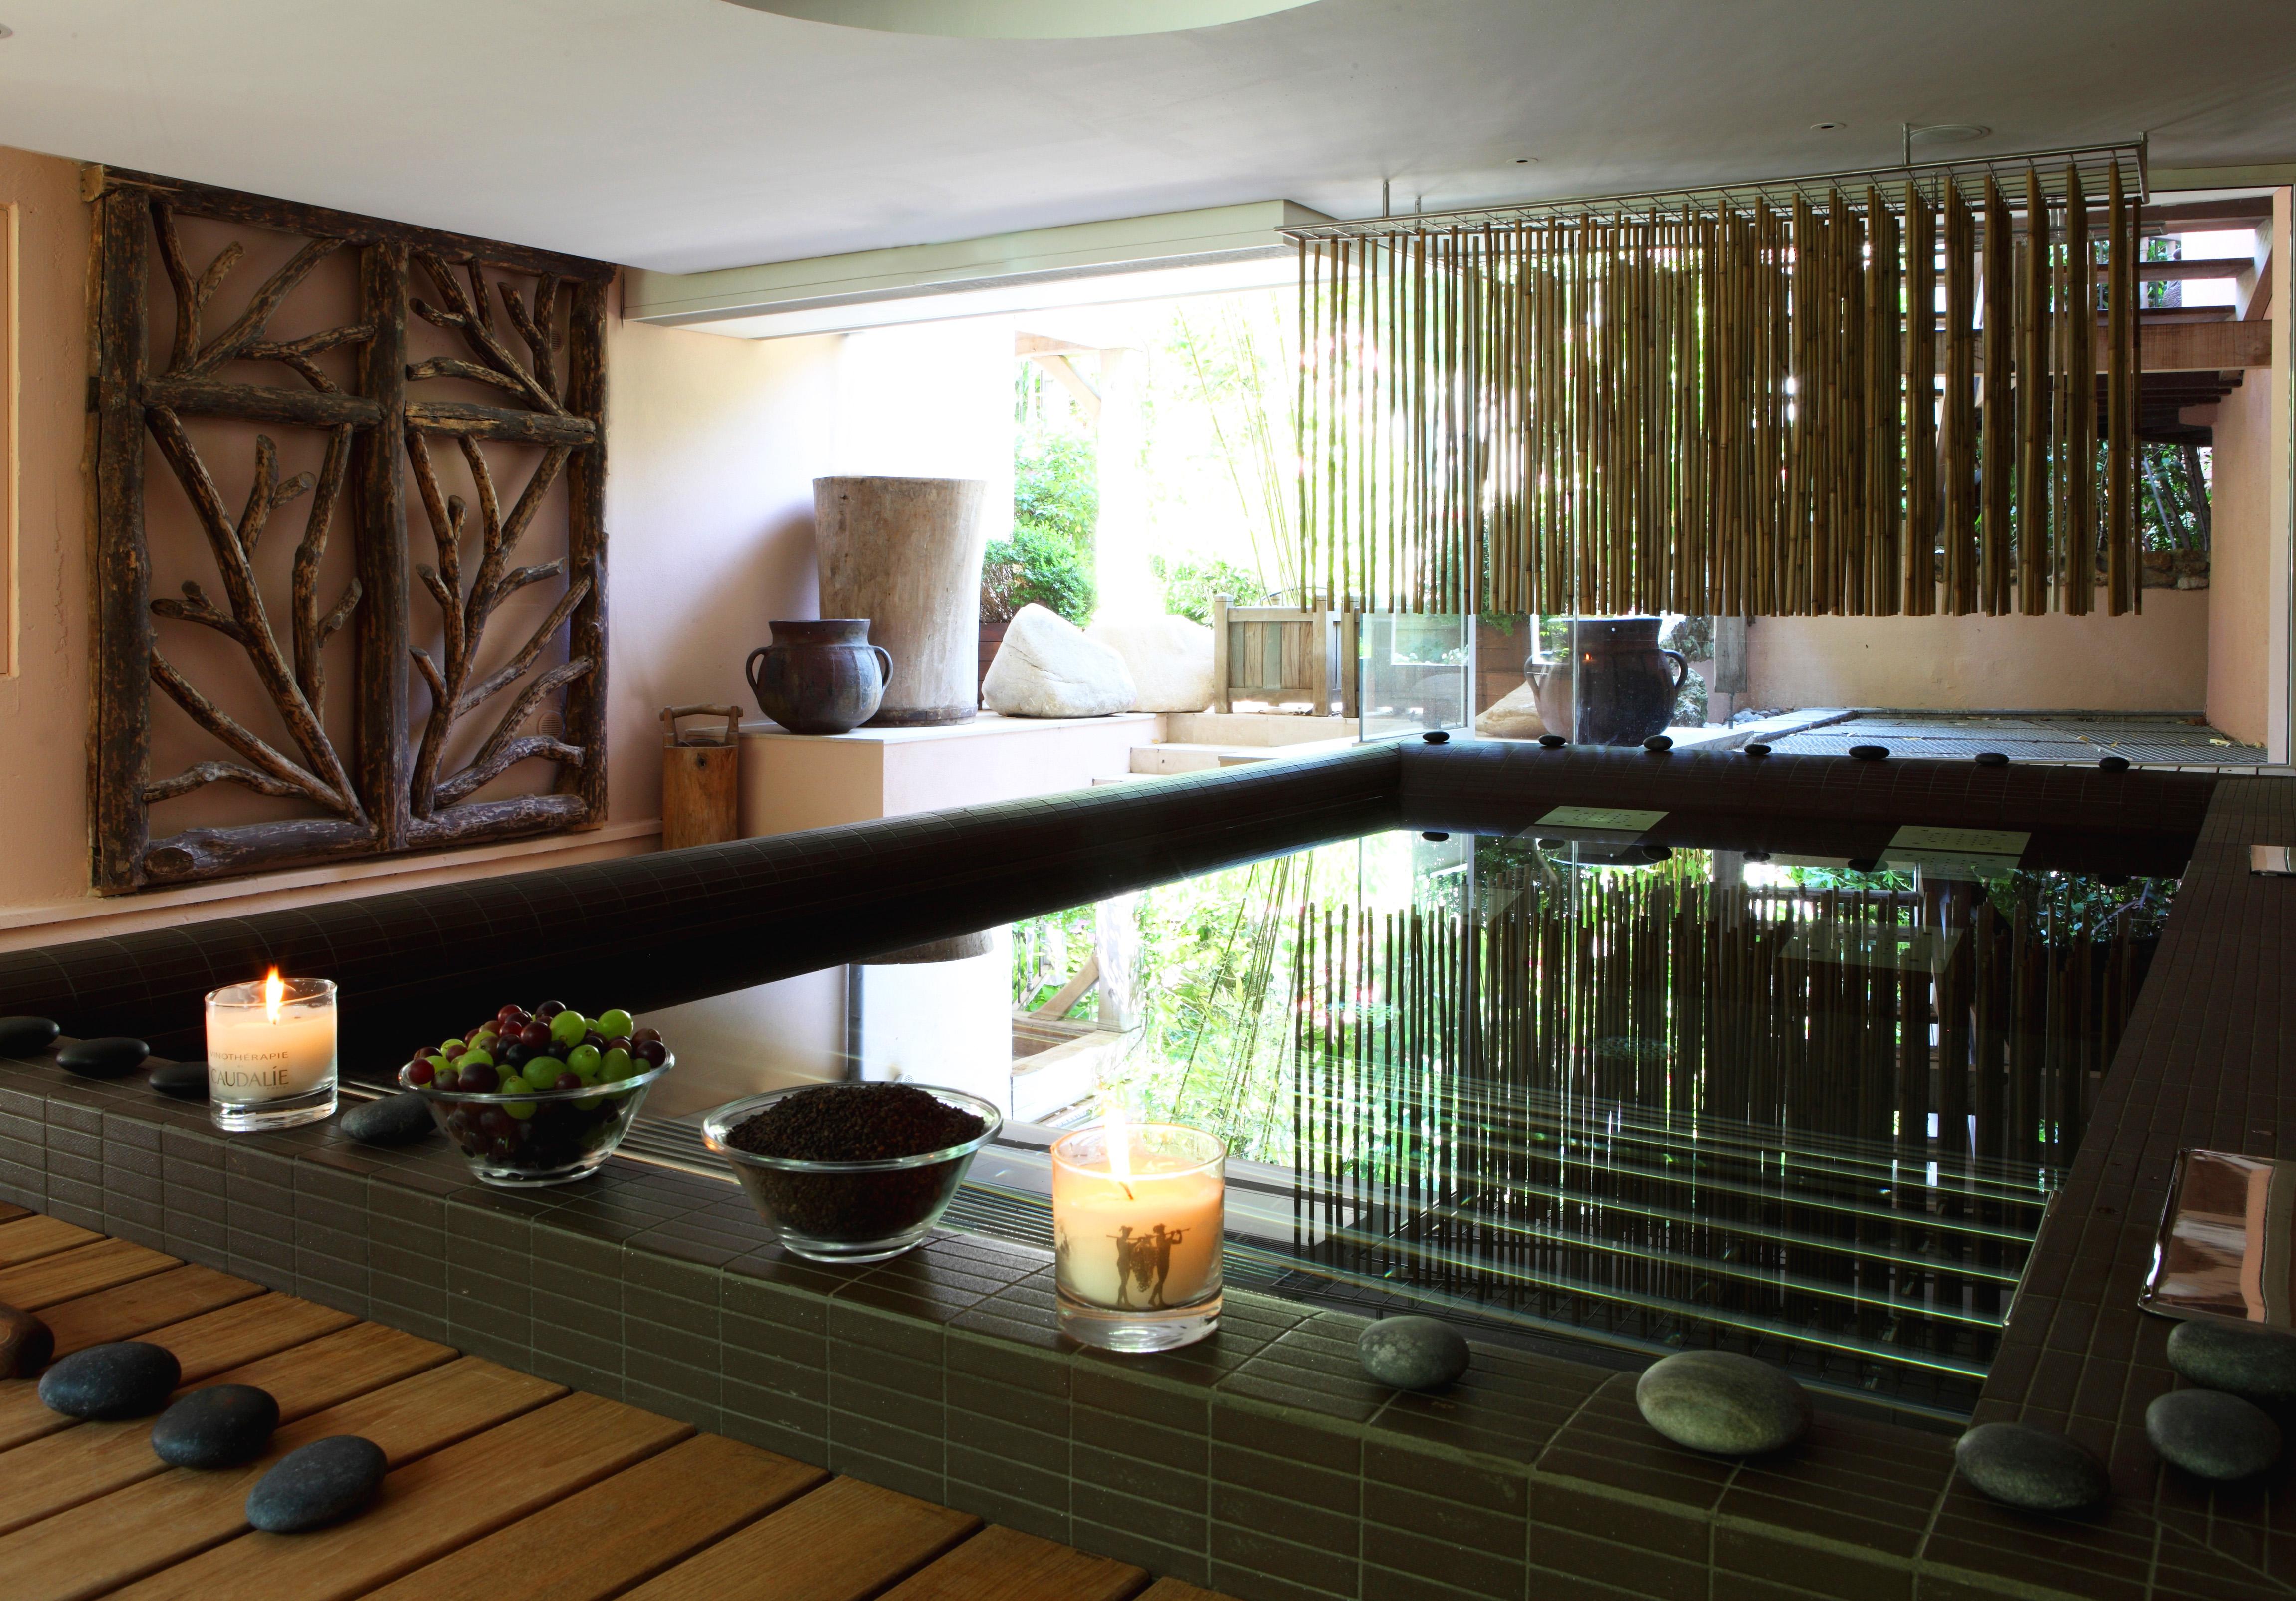 top 5 des spas de marque la bulle. Black Bedroom Furniture Sets. Home Design Ideas